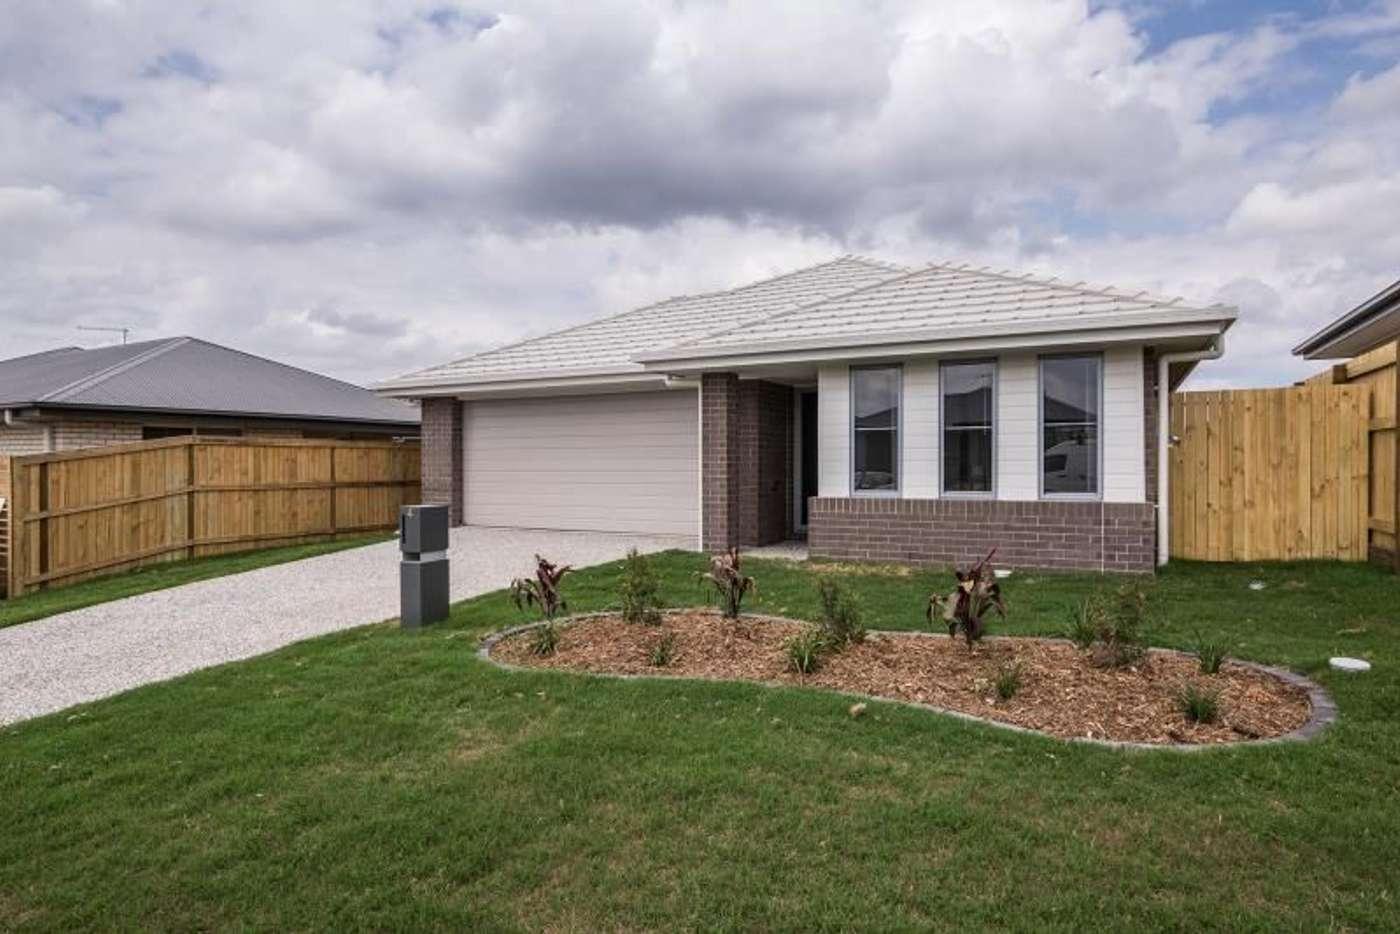 Main view of Homely house listing, 4 Tirrel Street, Yarrabilba QLD 4207